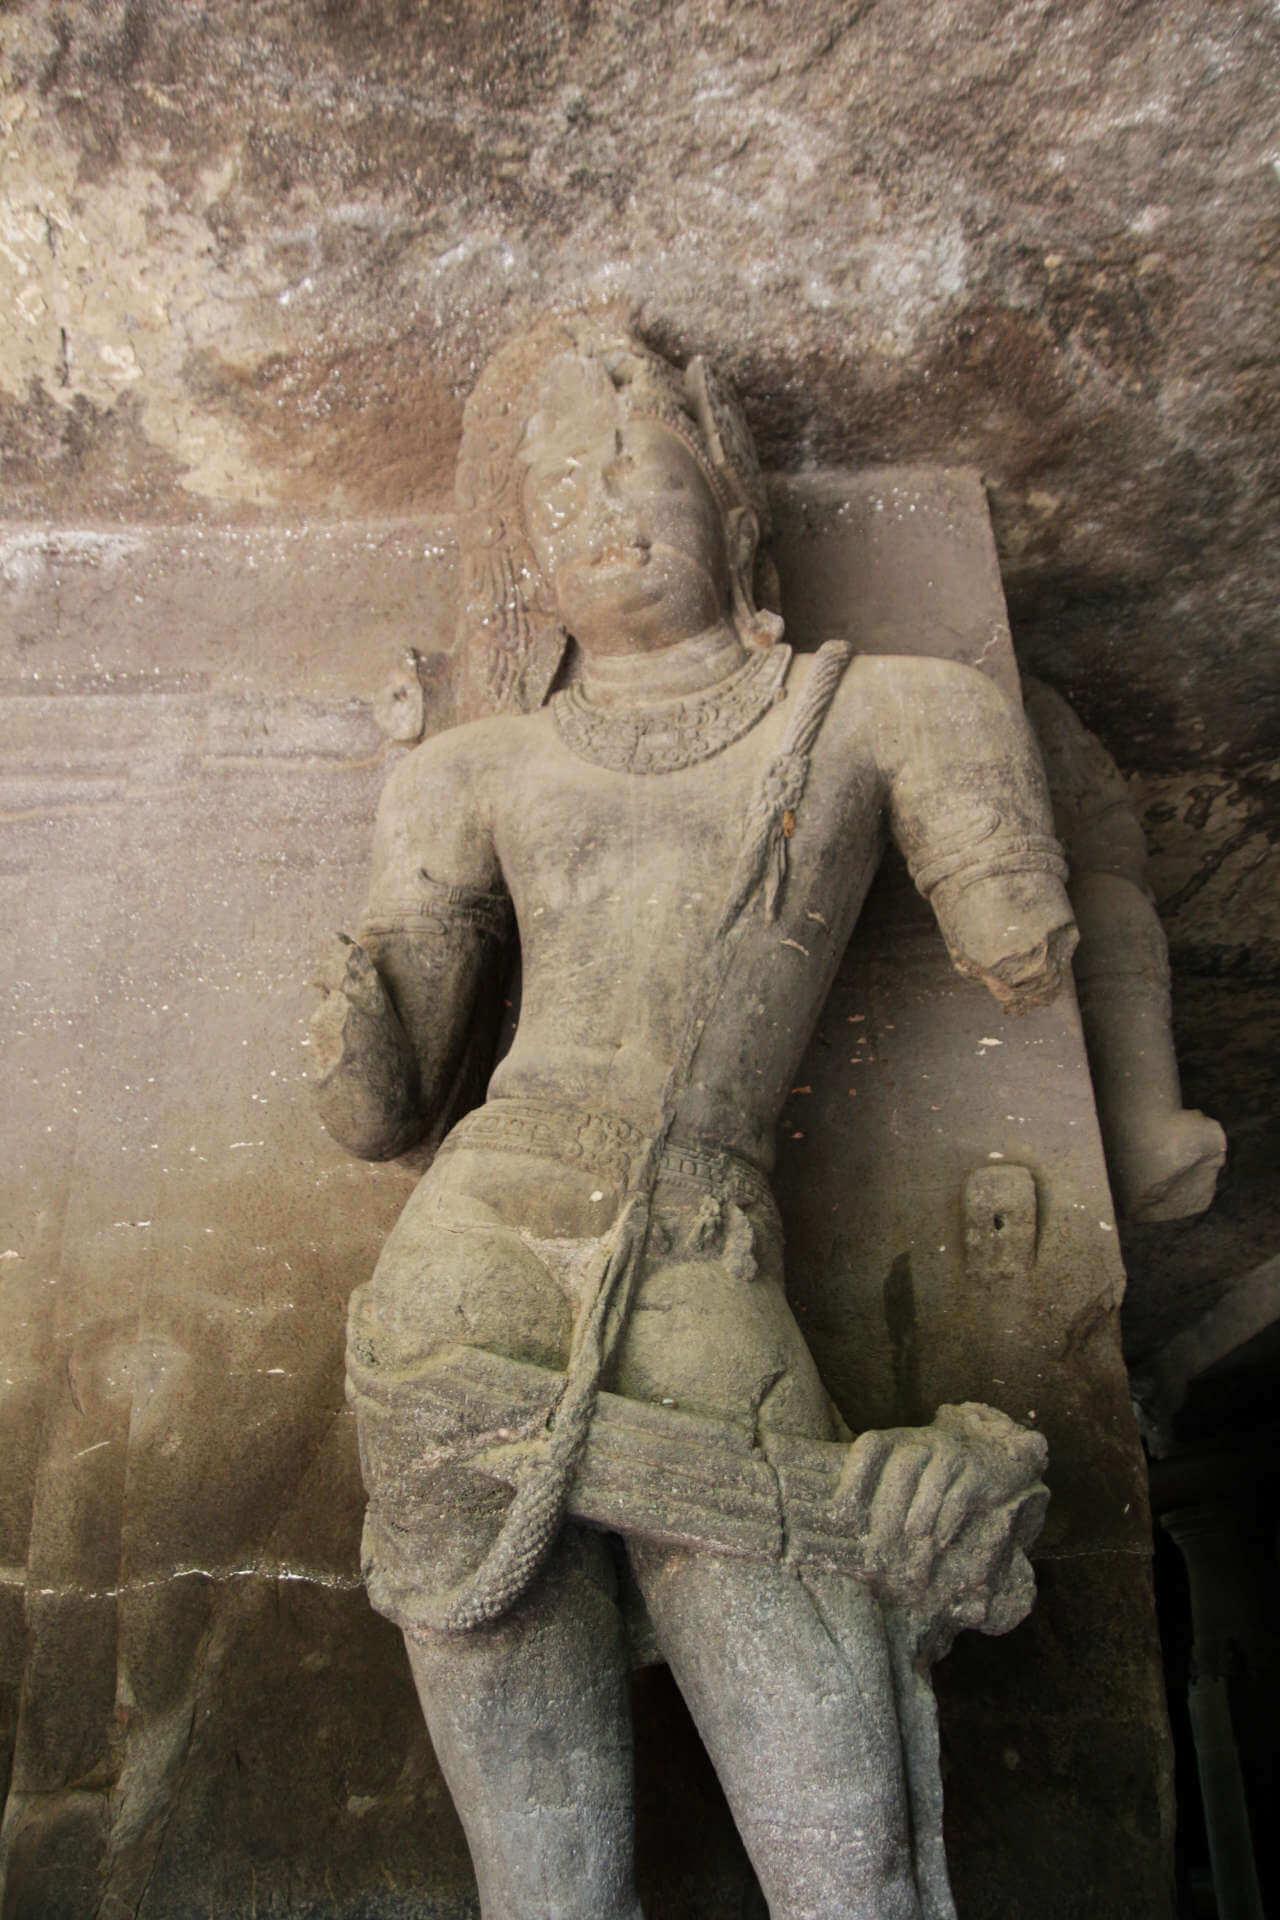 Indien Mumbai Elephanta Island Statue 1